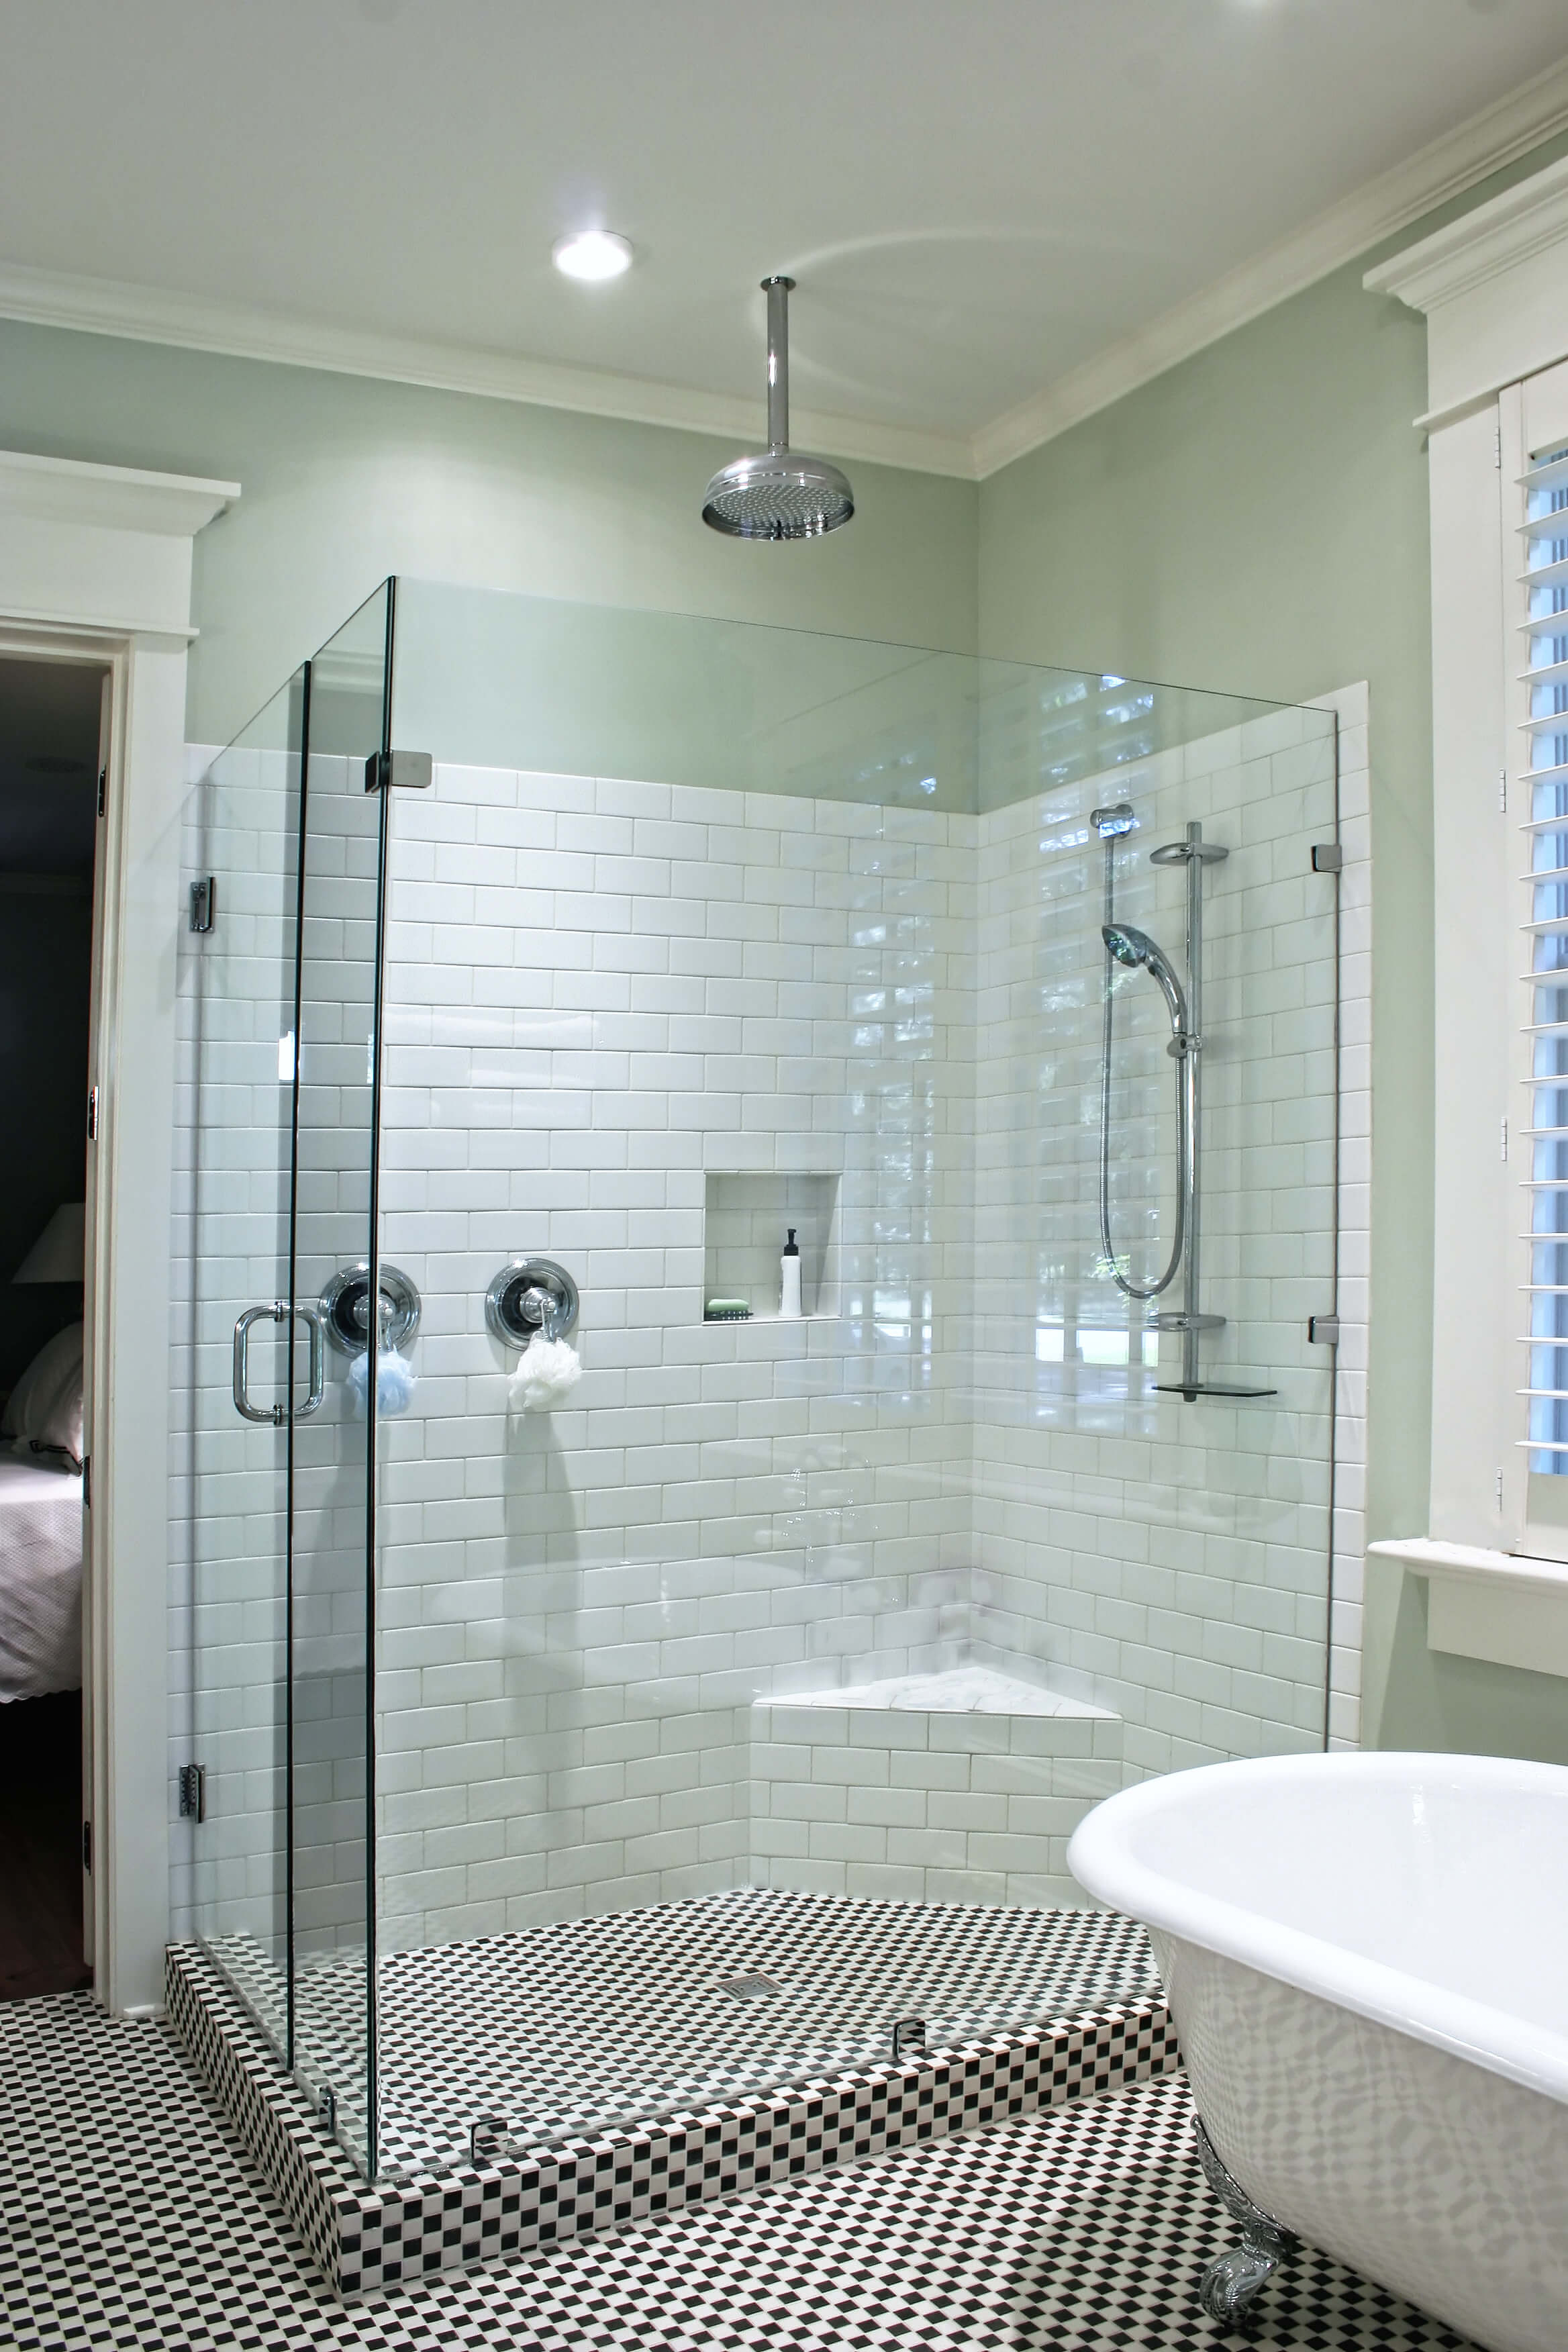 Bathroom Design and Decor Ideas (LUXURY BATHROOMS)